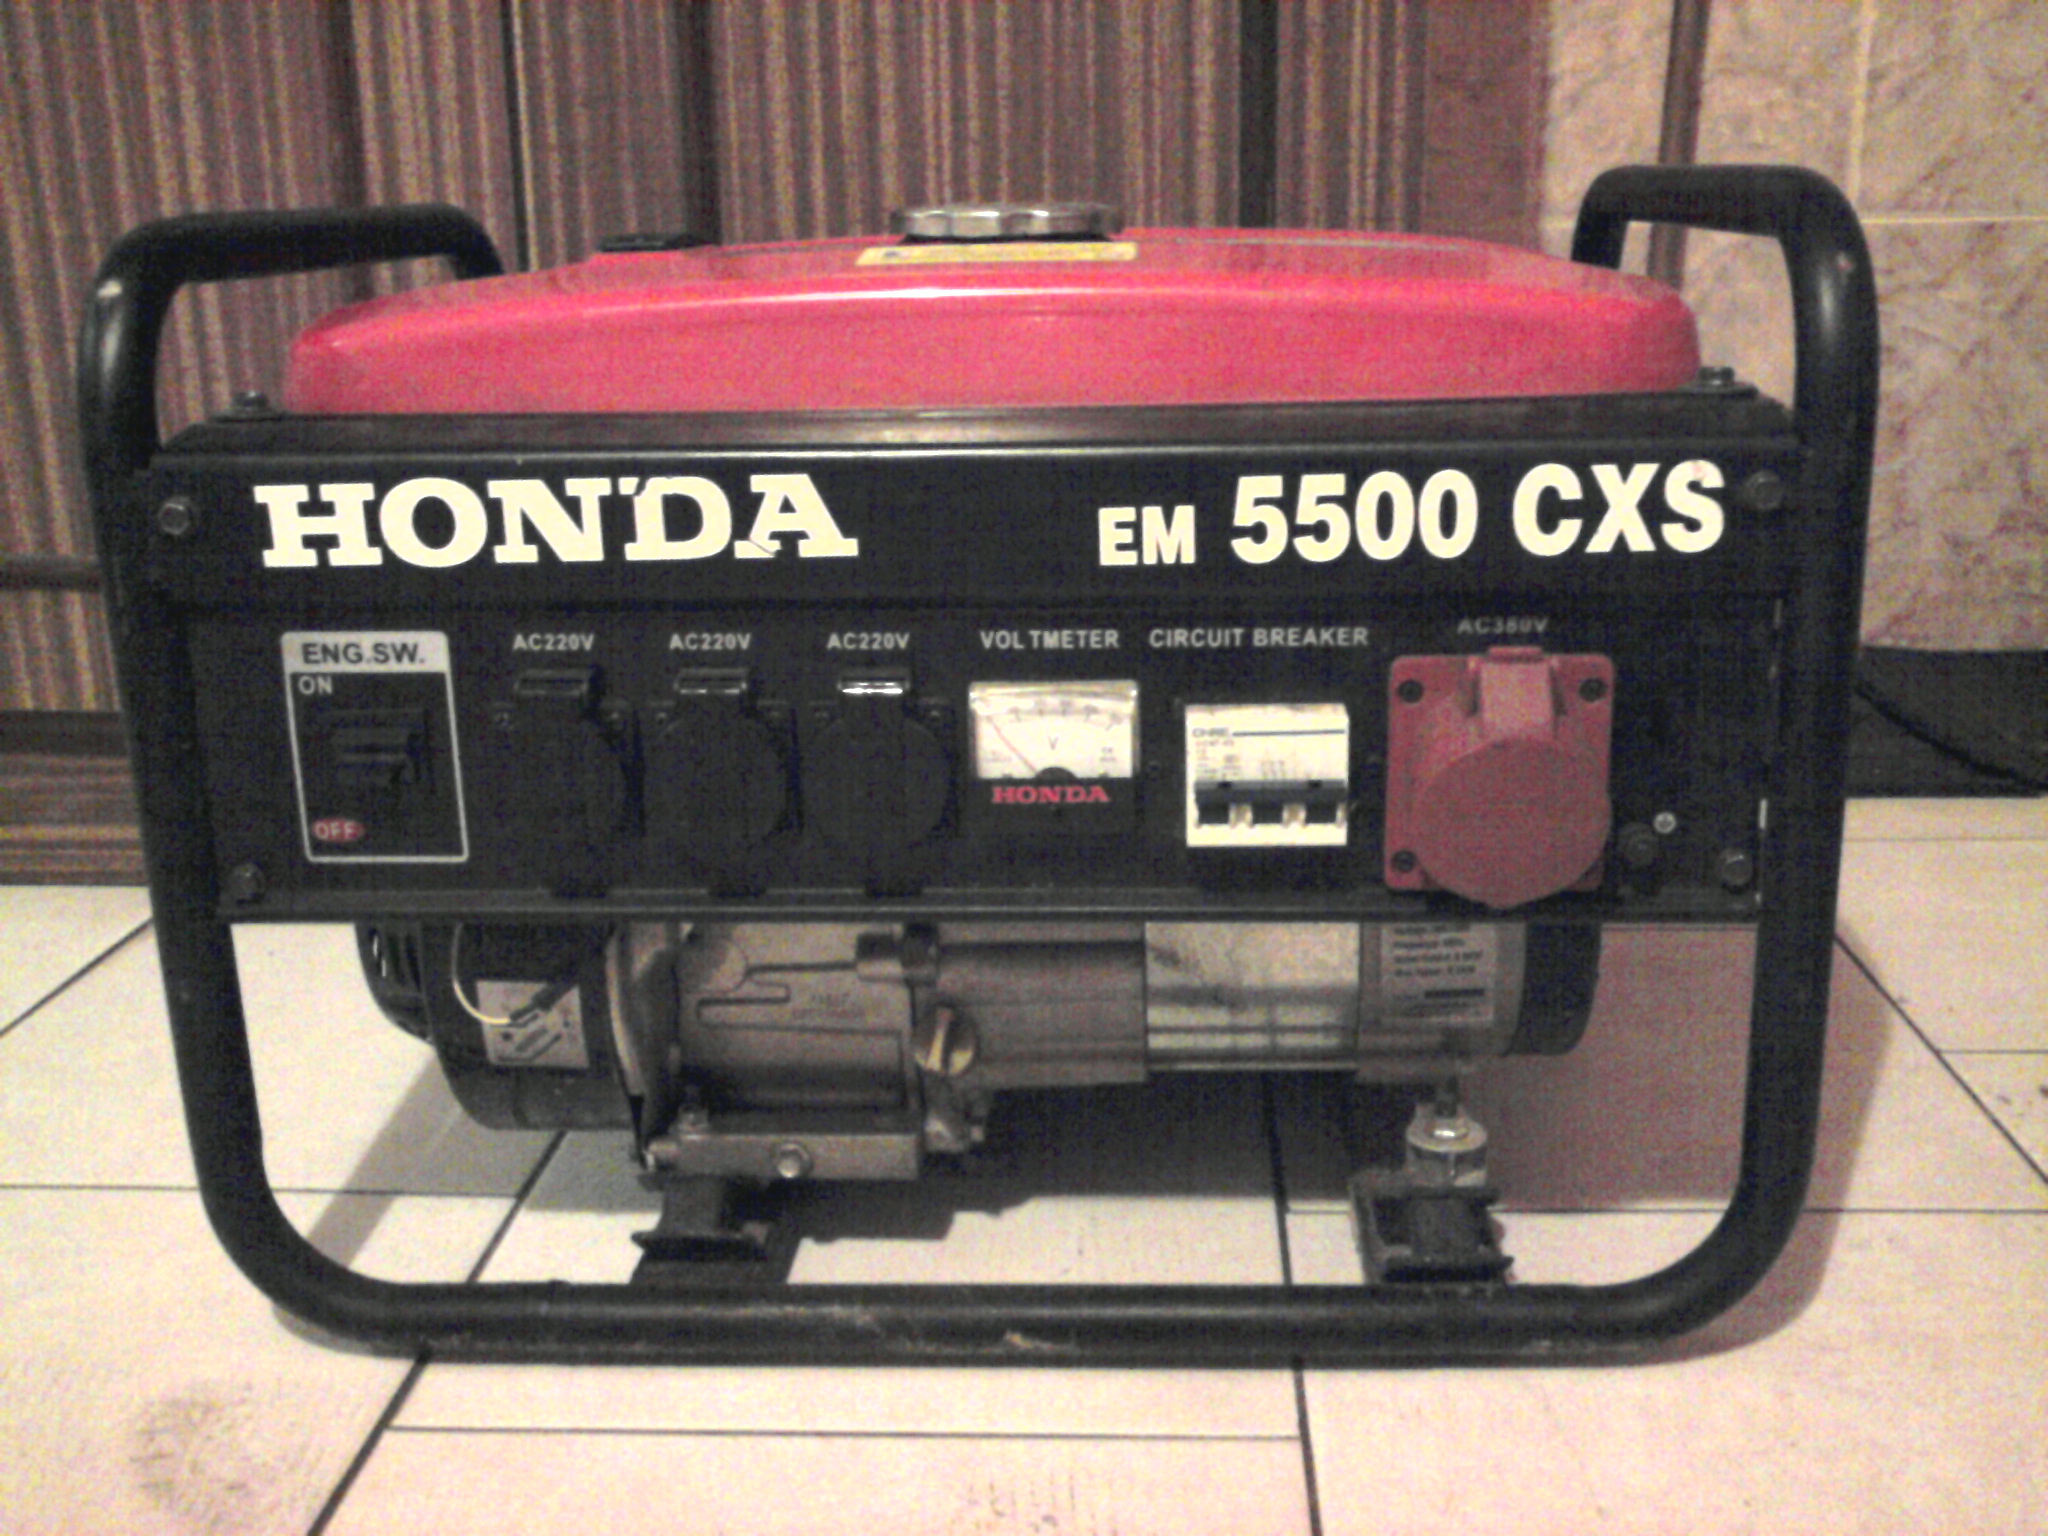 Agragat  pseudo Honda EM 5500 CXS - schemat uzwojenia.